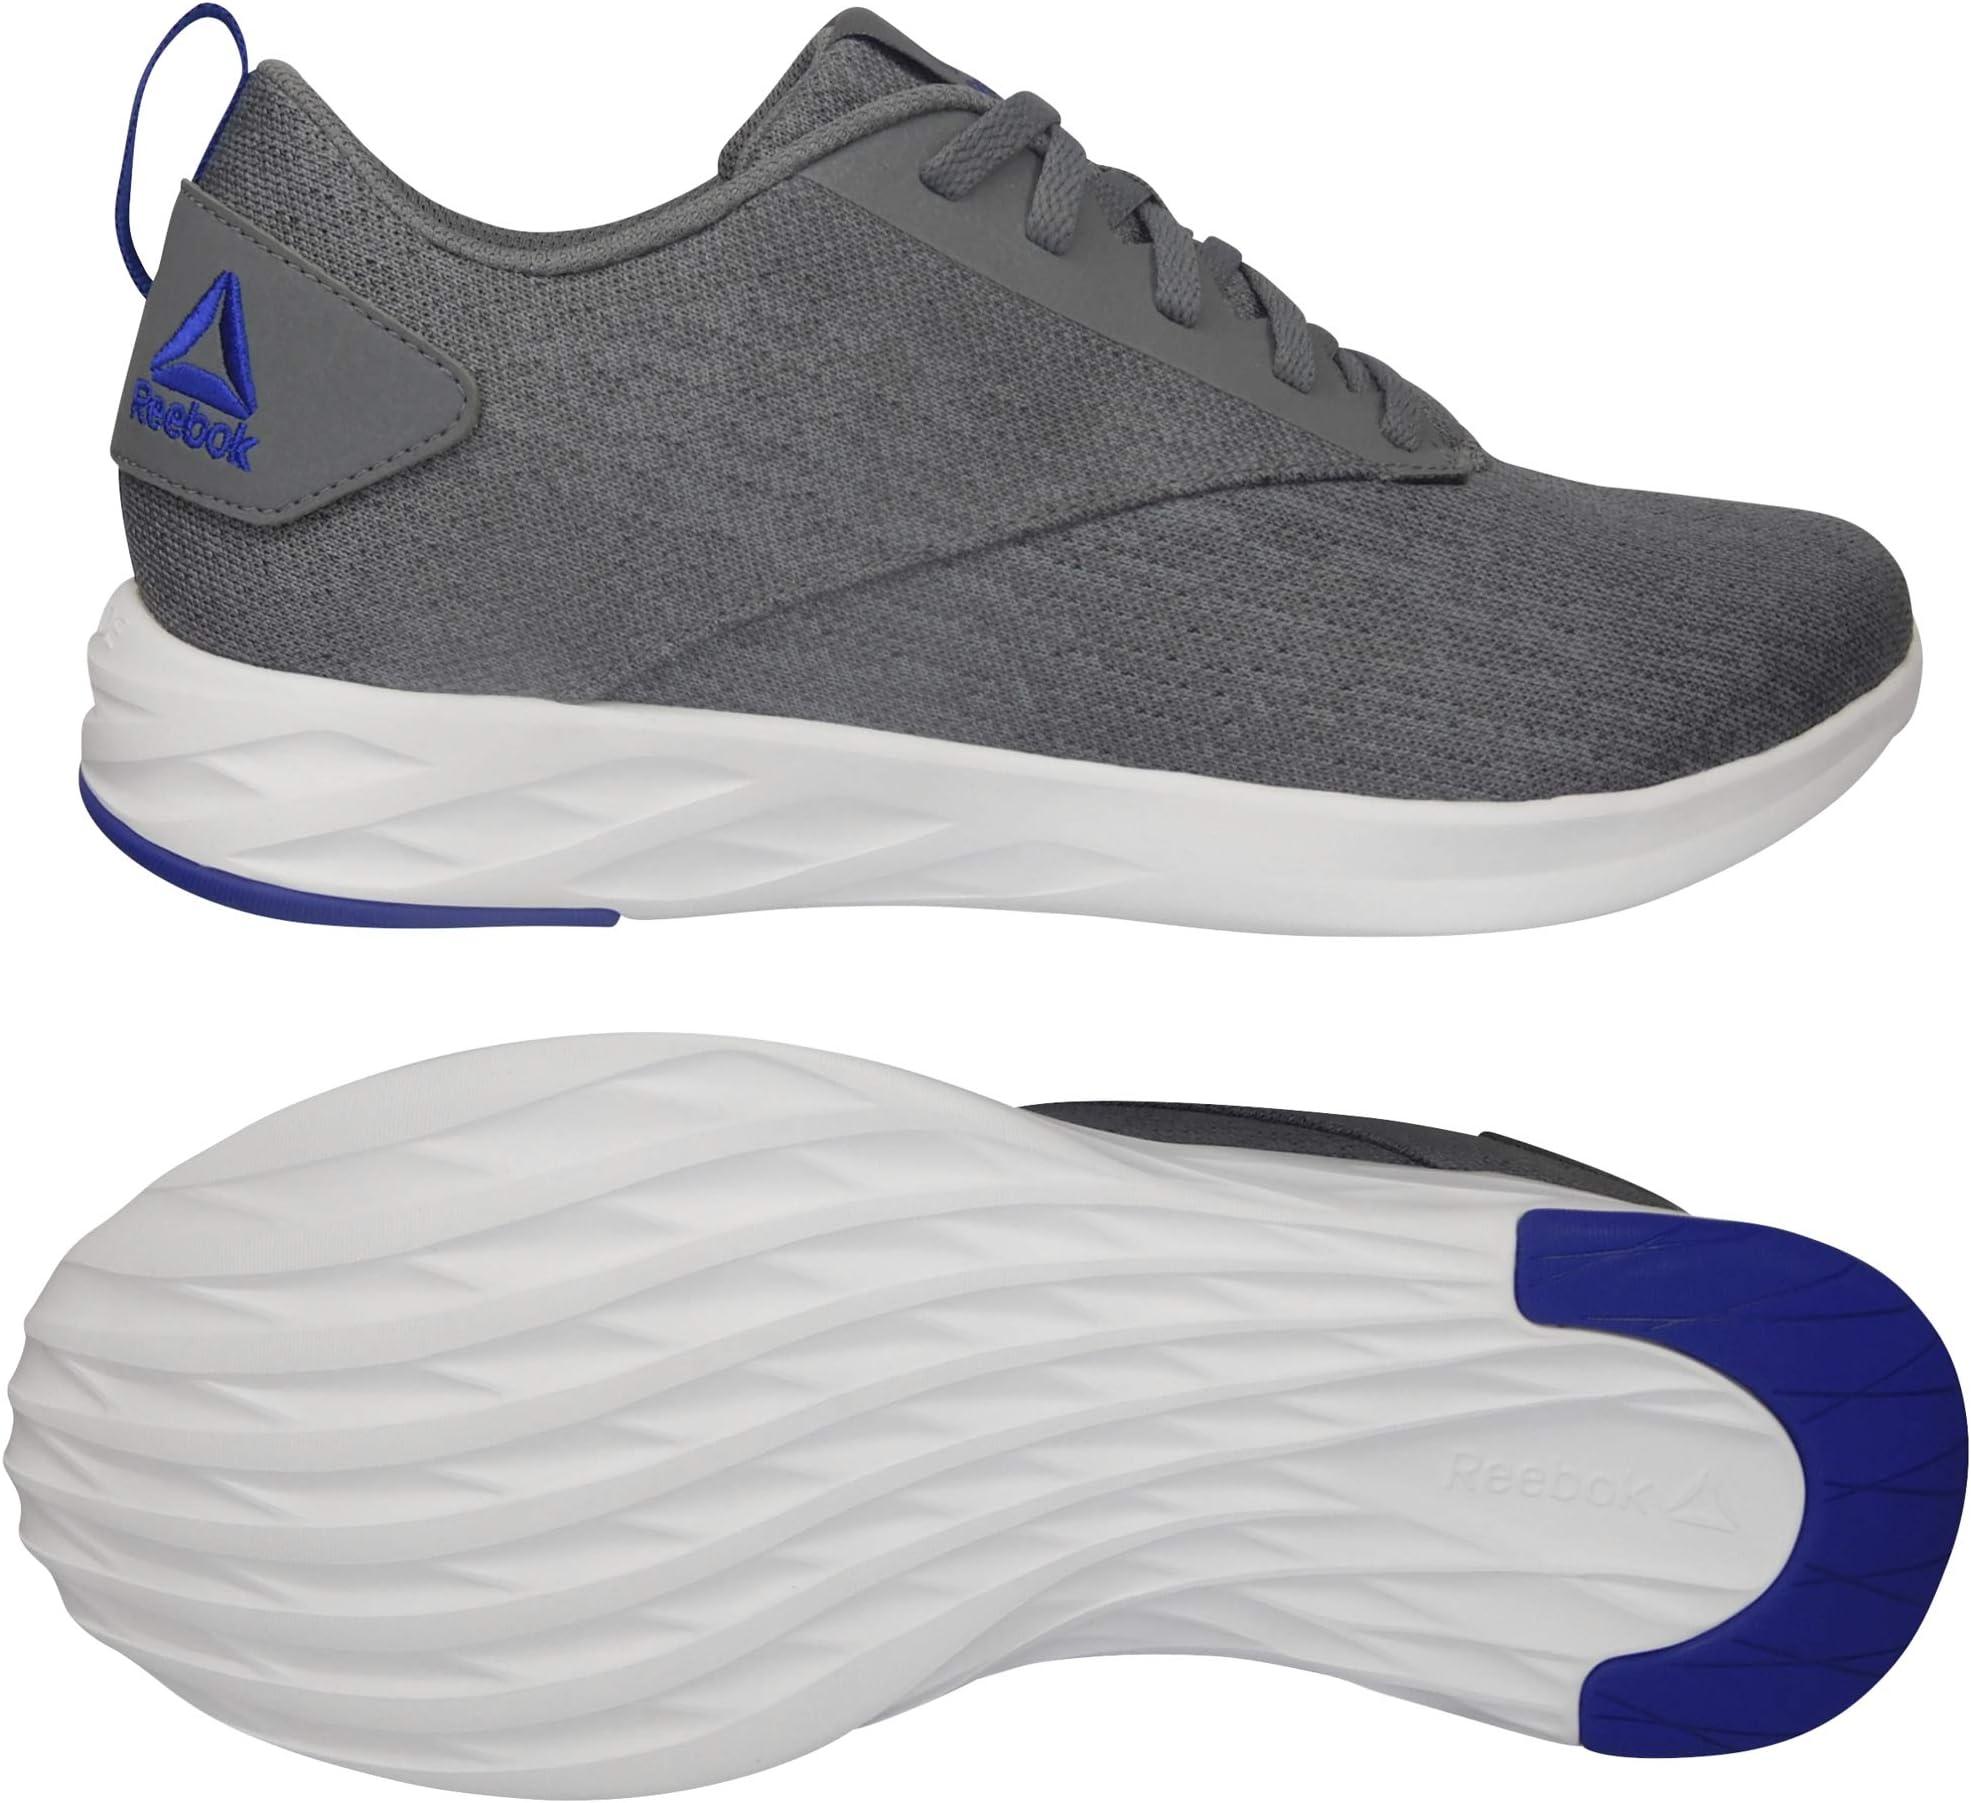 Peatonal Prestigioso hielo  Reebok REEBOK ASTRORIDE SOUL 2.0 Men's Men Road Running Shoes price in  Saudi Arabia | Amazon Saudi Arabia | kanbkam